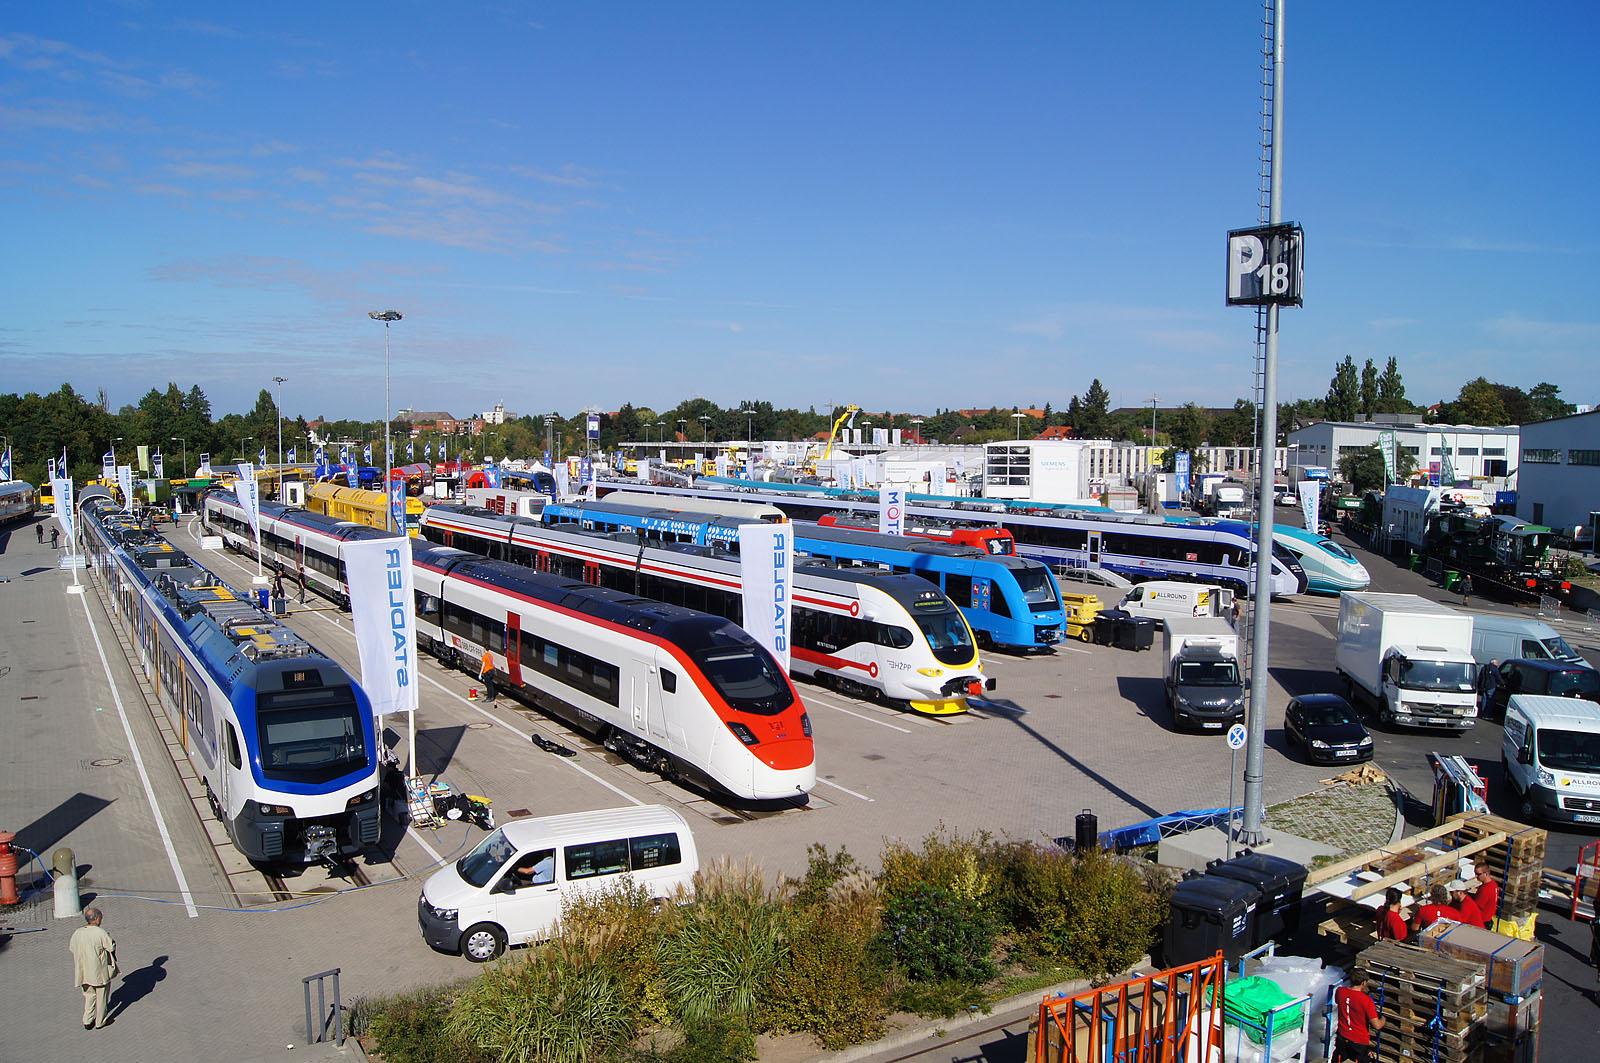 [CH] In the picture: Stadler Rail's Giruno for SBB